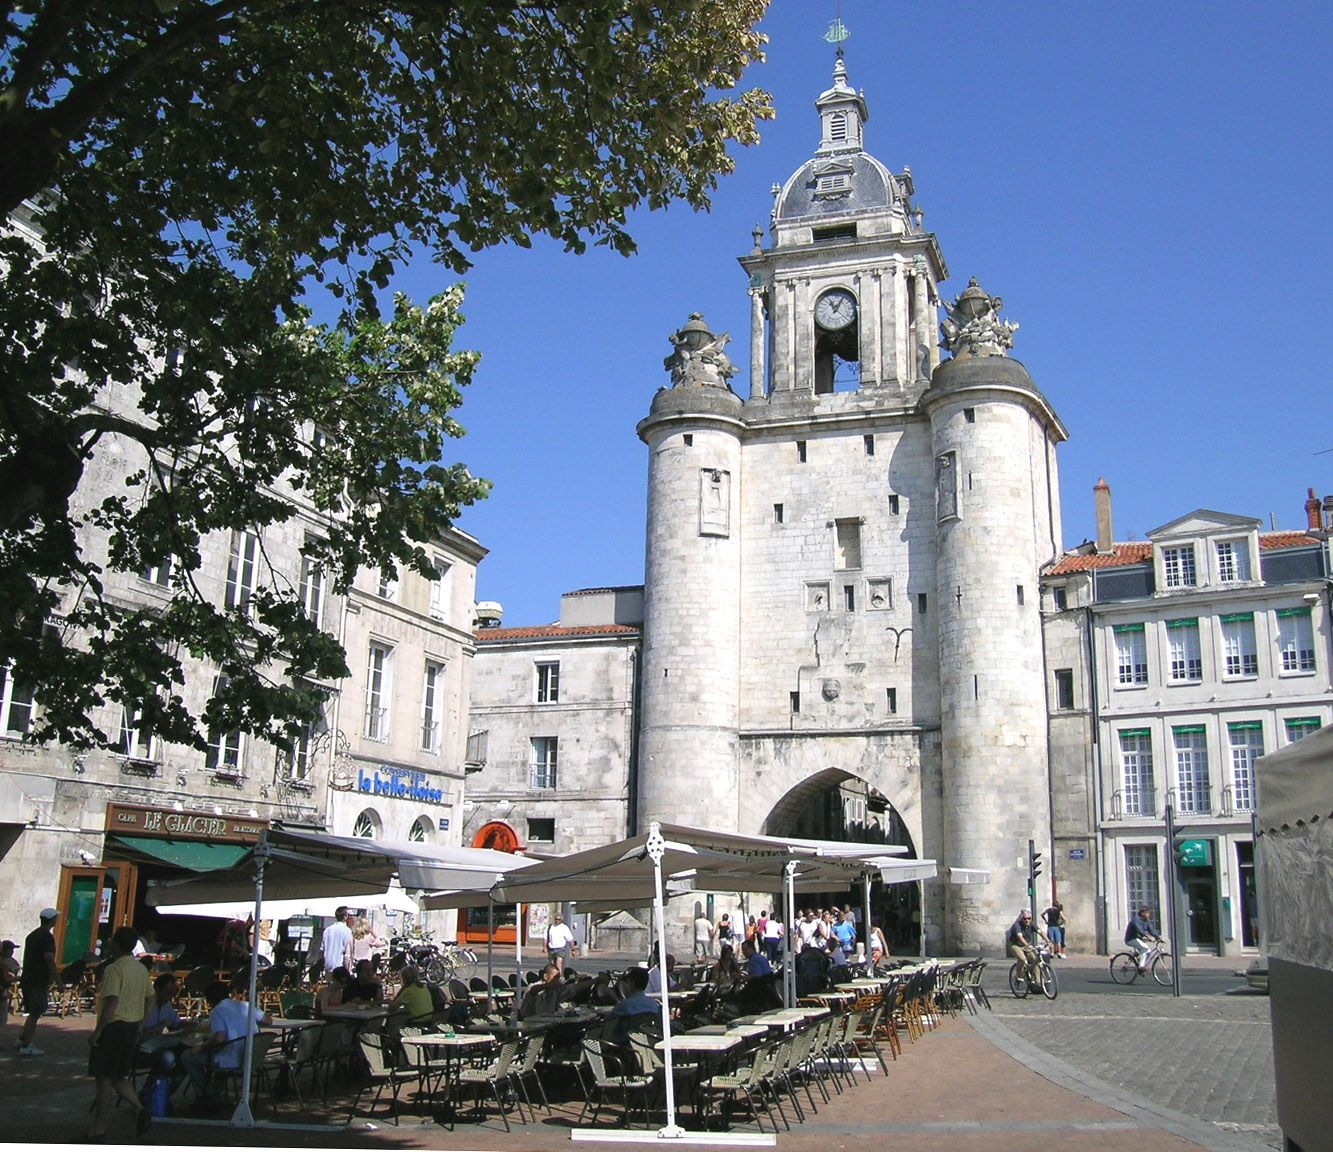 Grande Horloge, La Rochelle, France